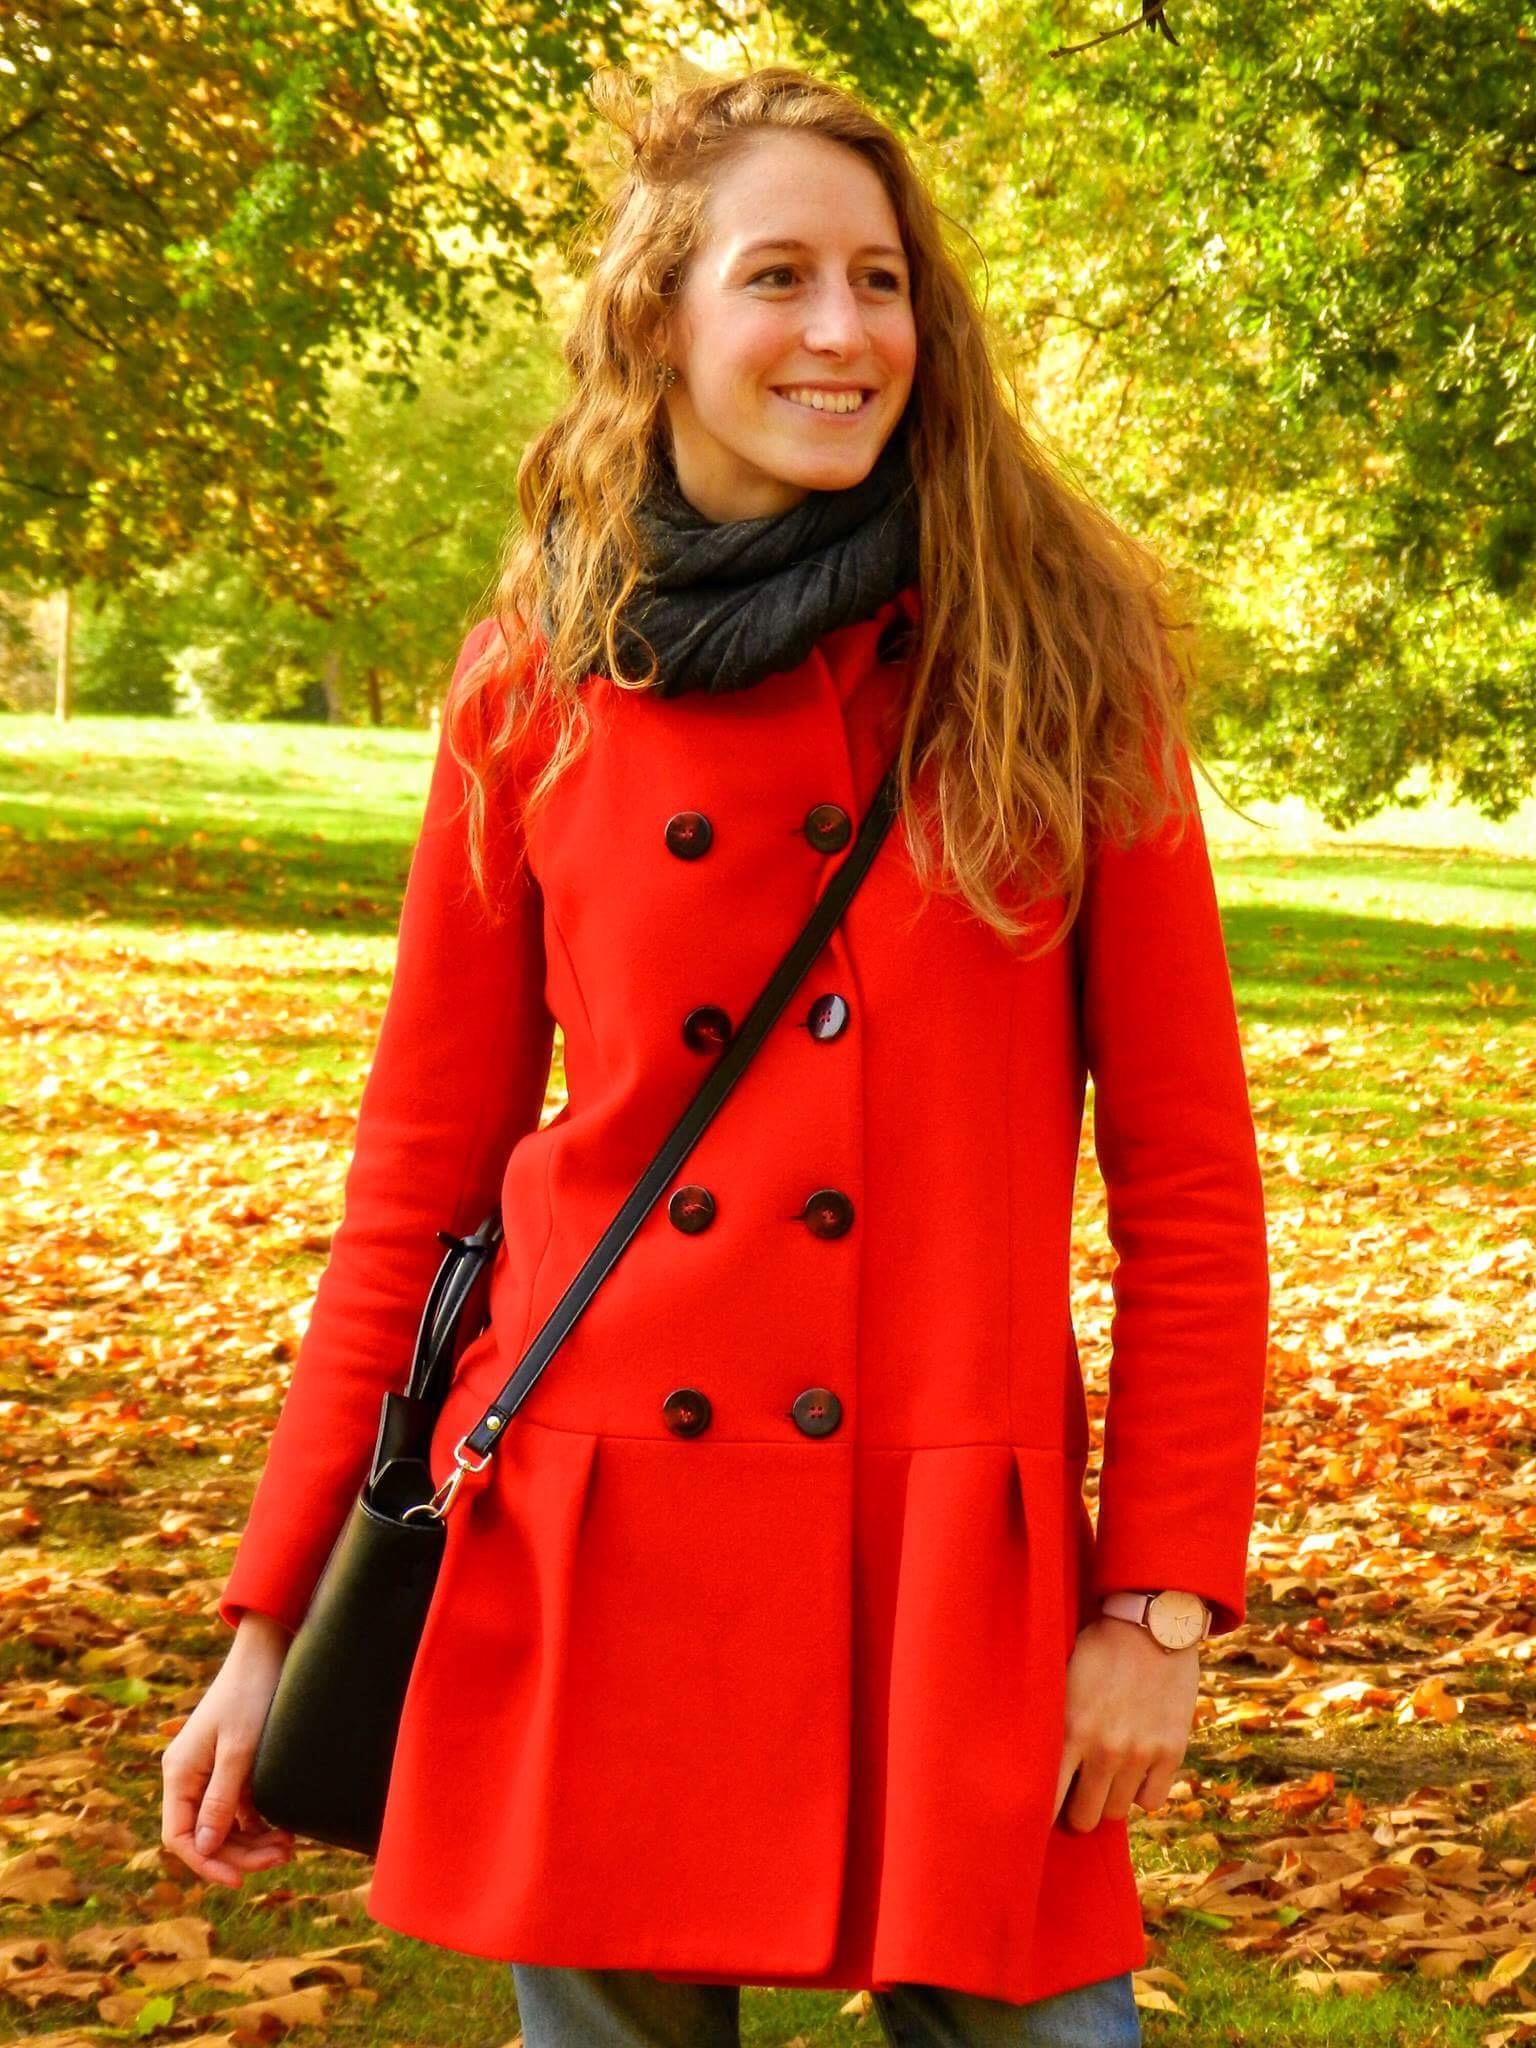 Giulia: a soli 24 anni project manager a Londra